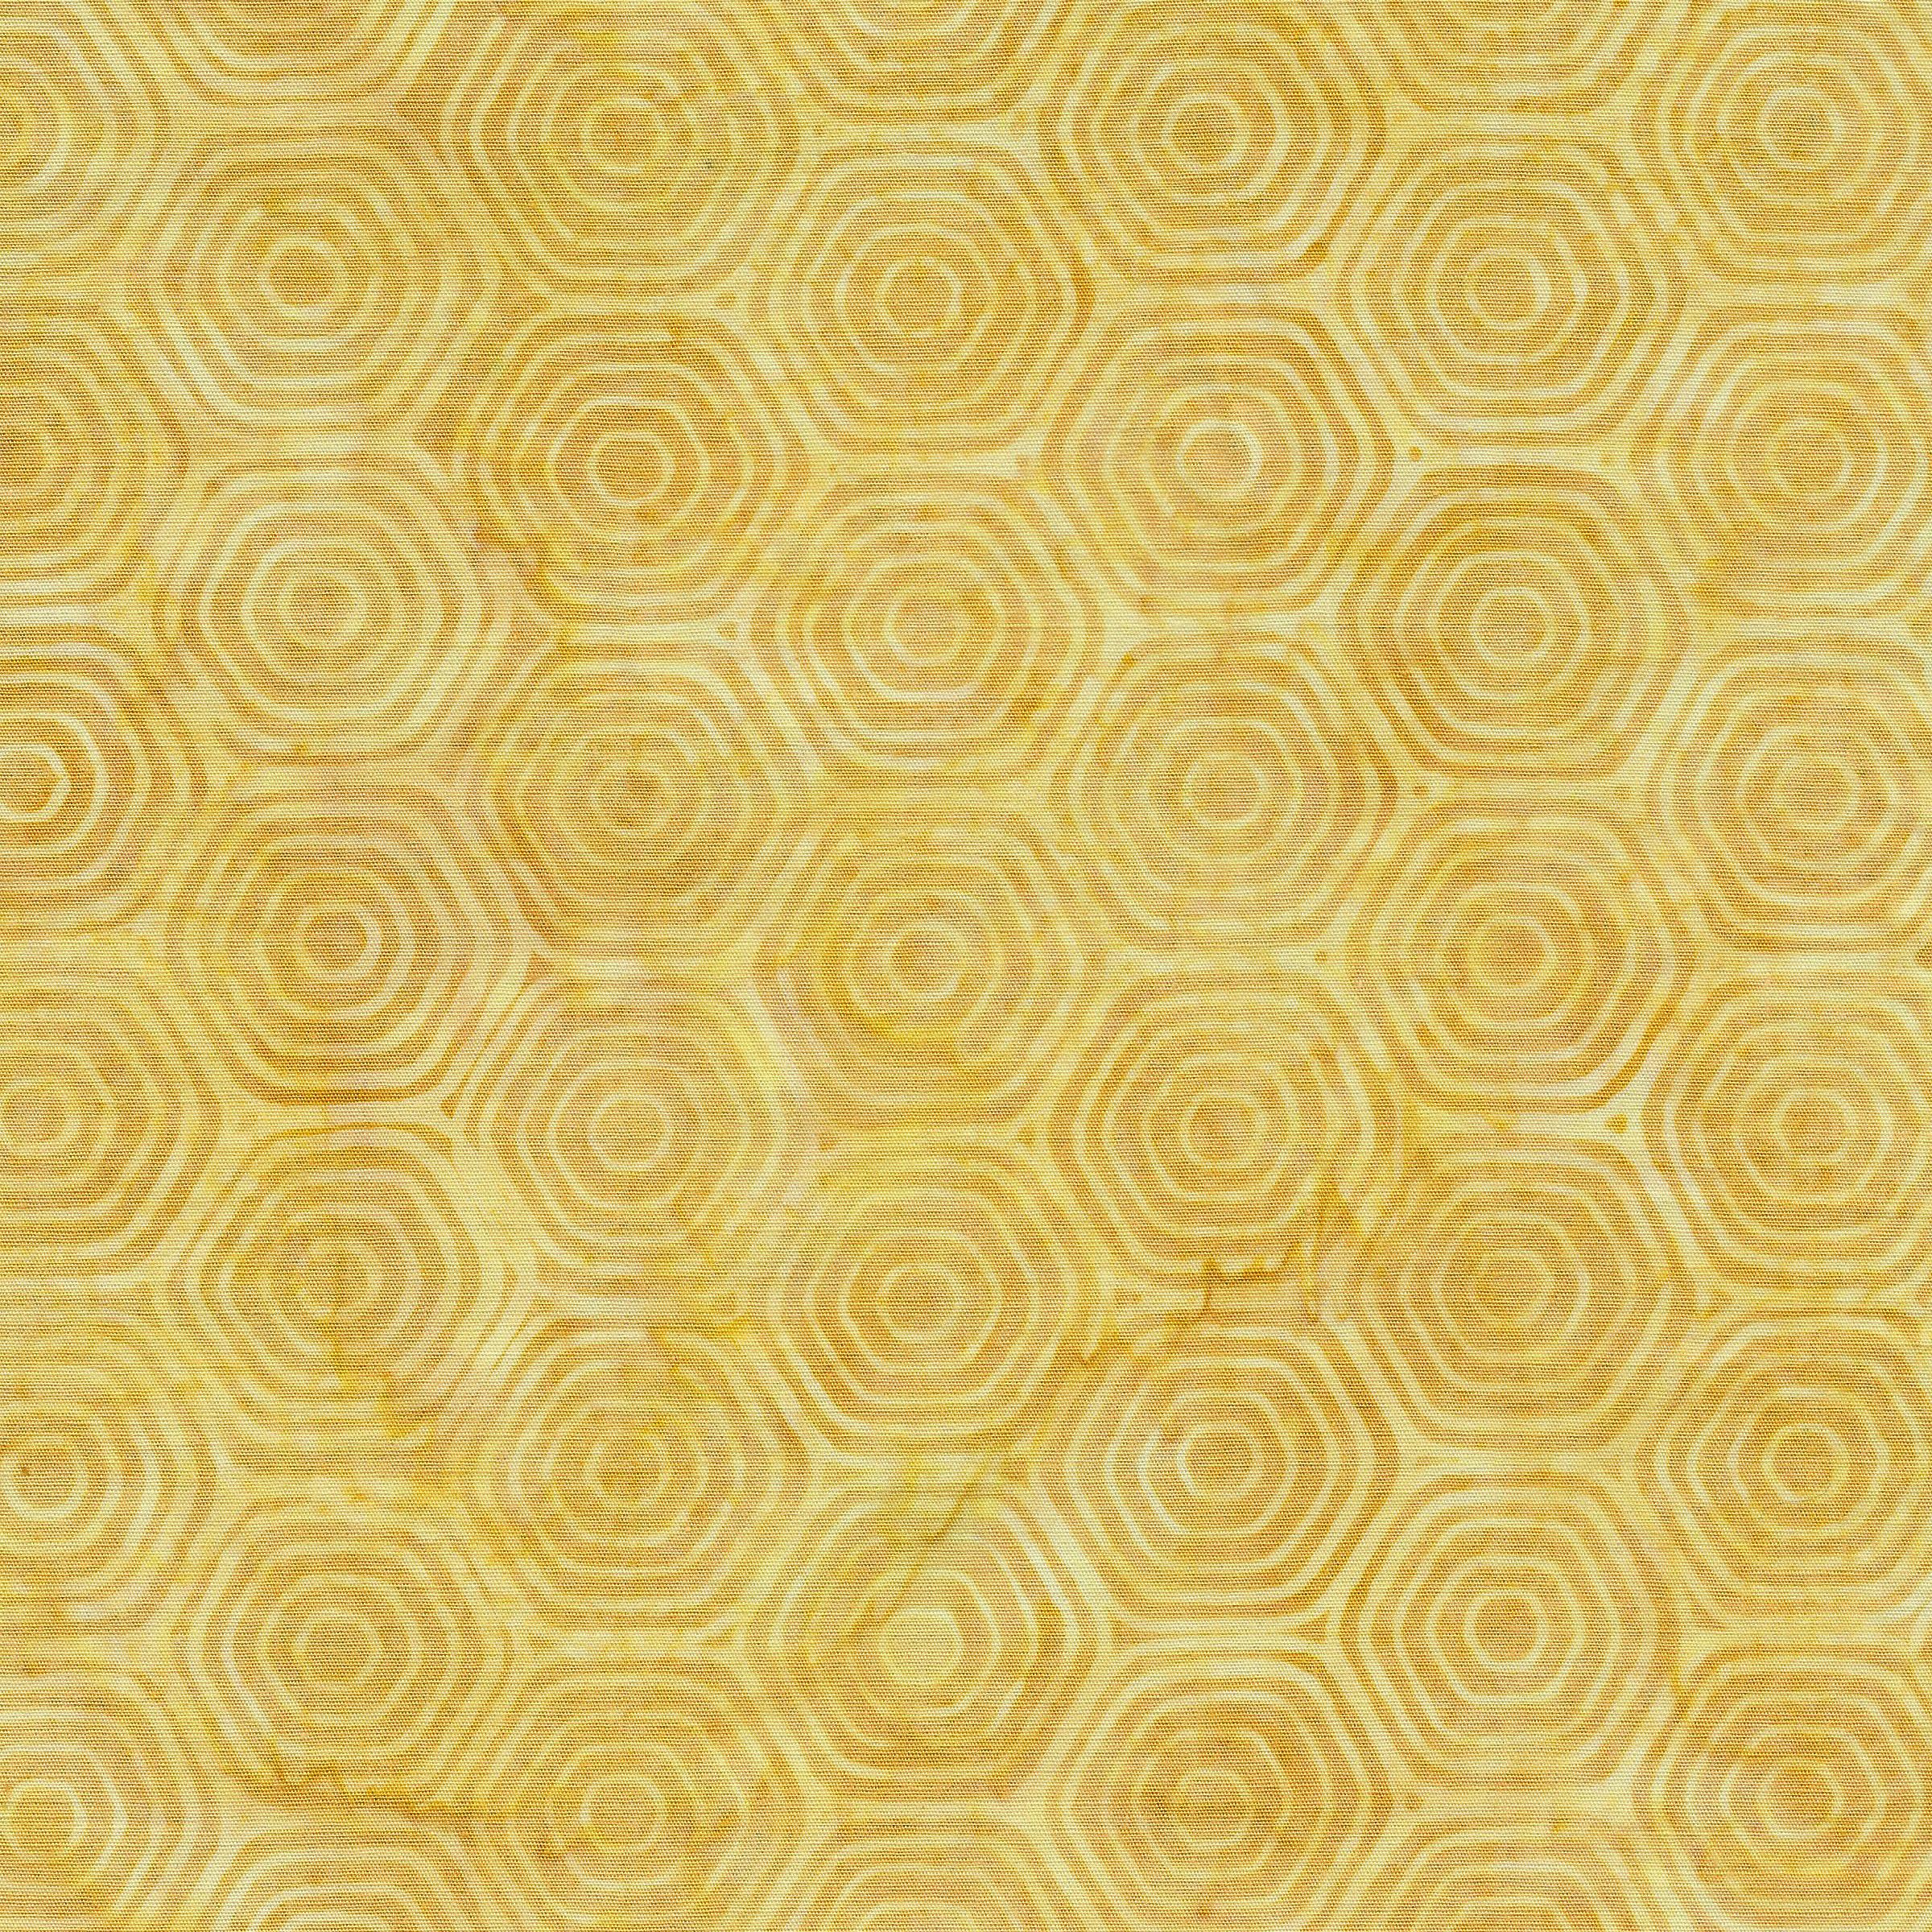 111916035 / Hexigon-Honey